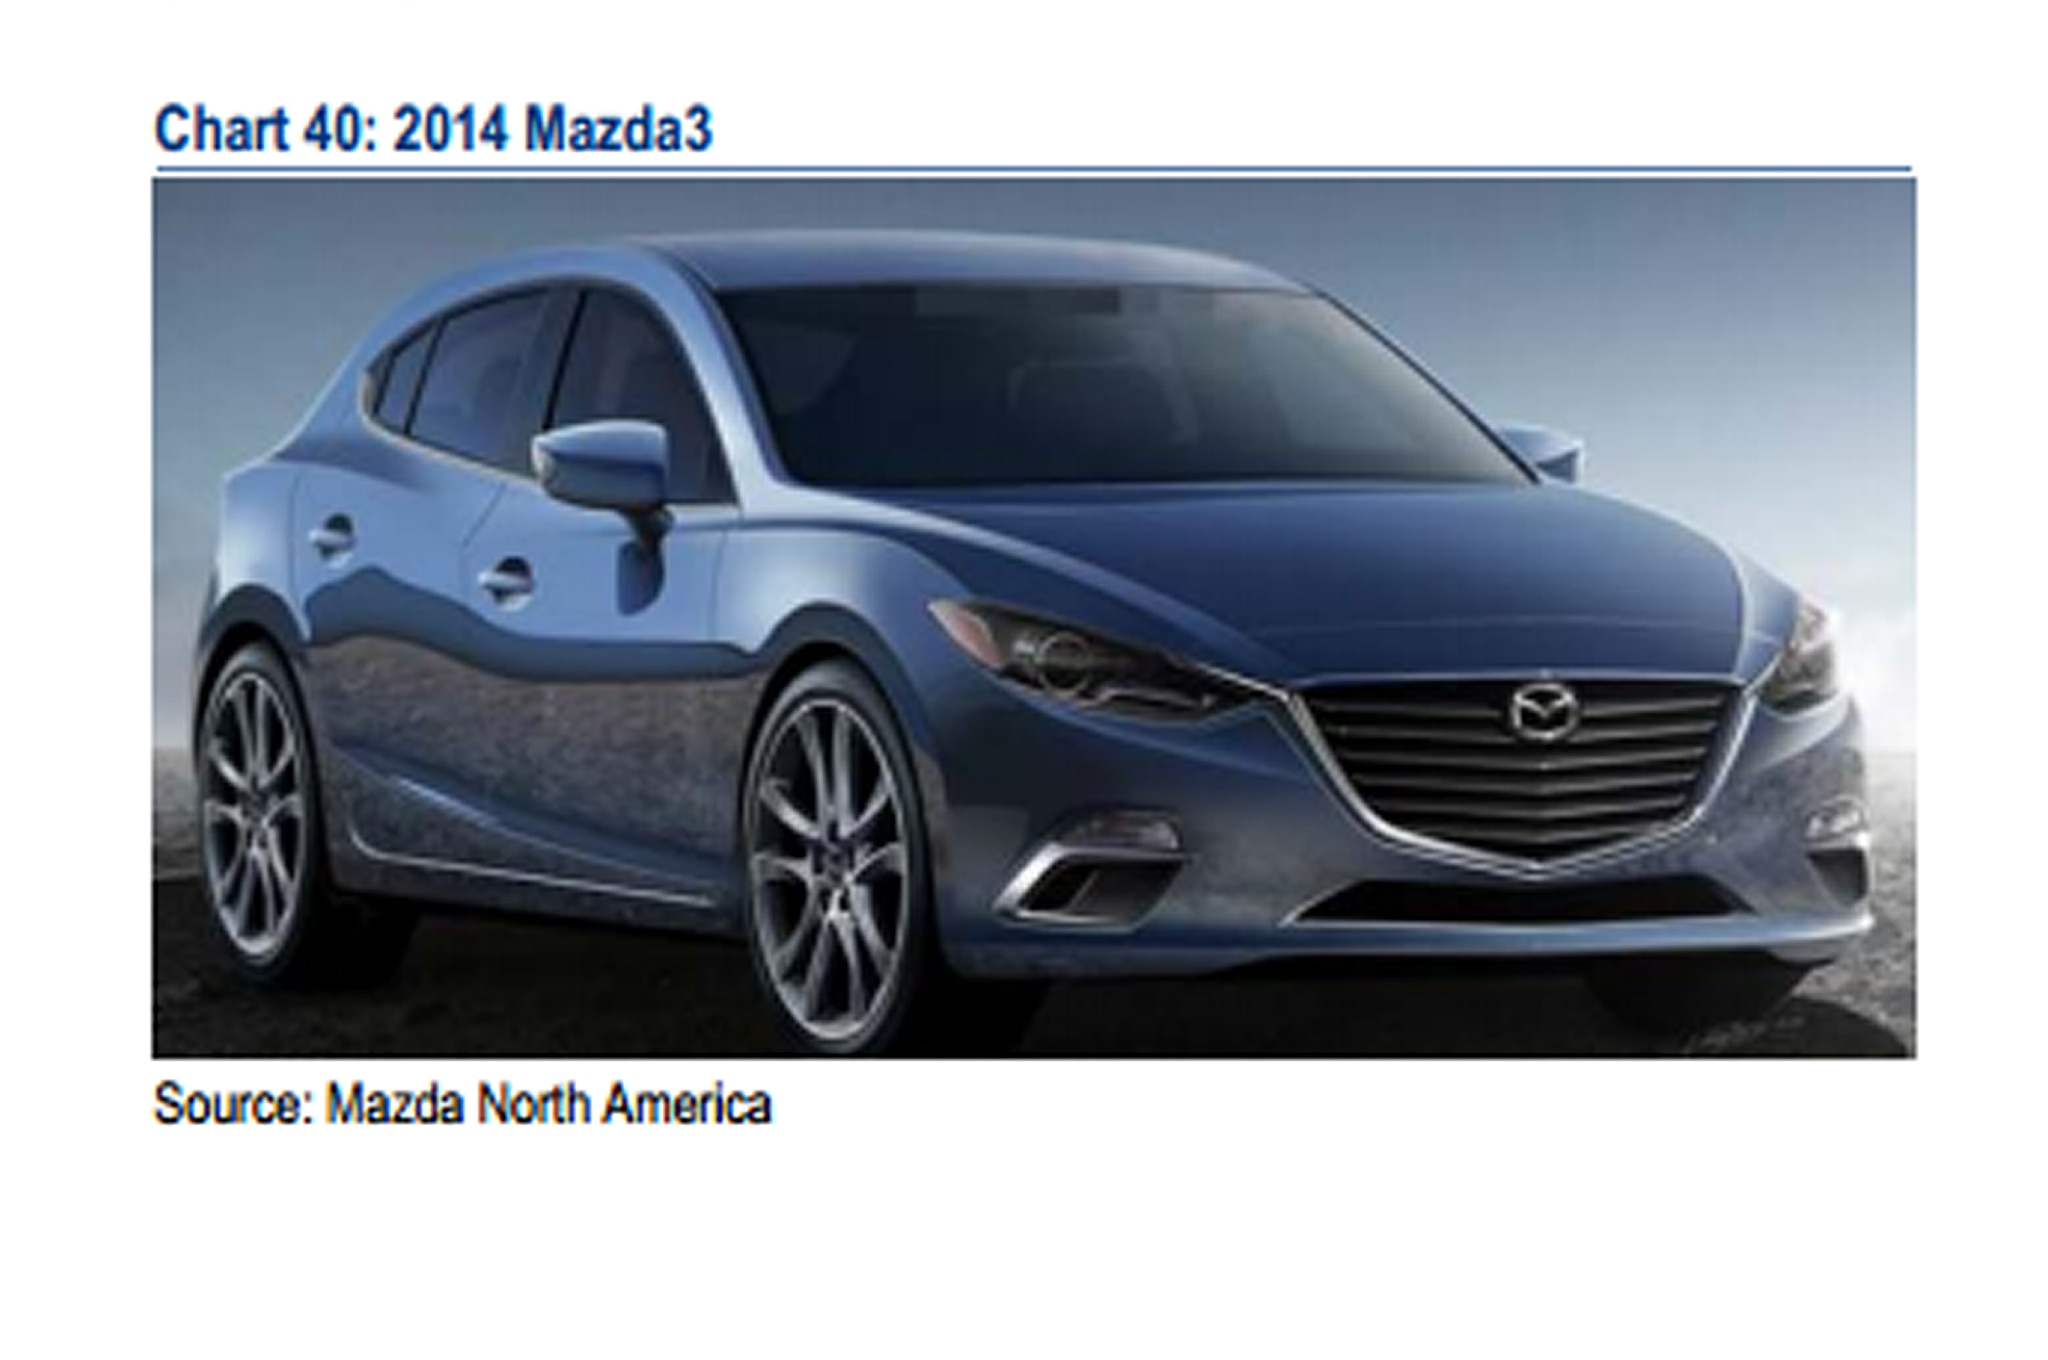 2015 Mazda 3 Front Three Quarter Leaked1